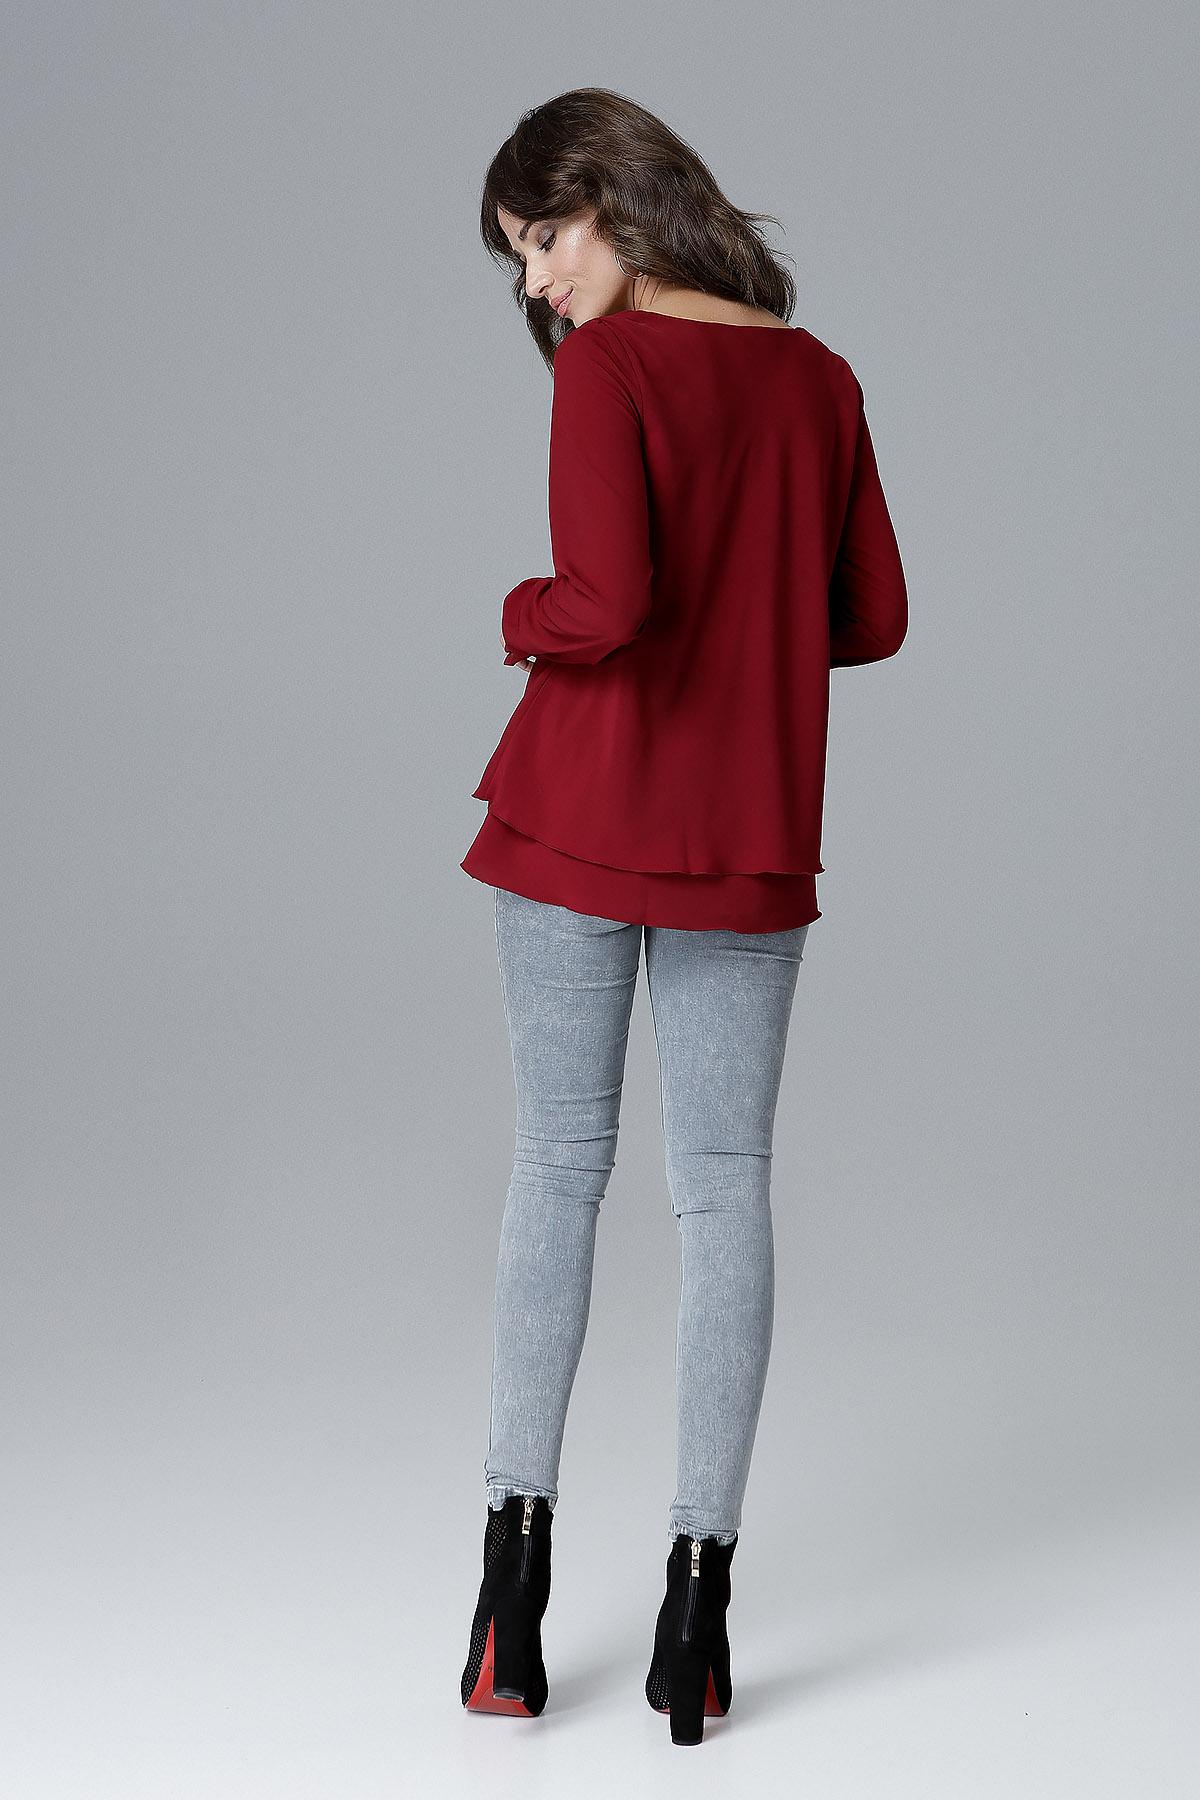 CM4157 Luźna bluzka damska z falbanką - bordowa